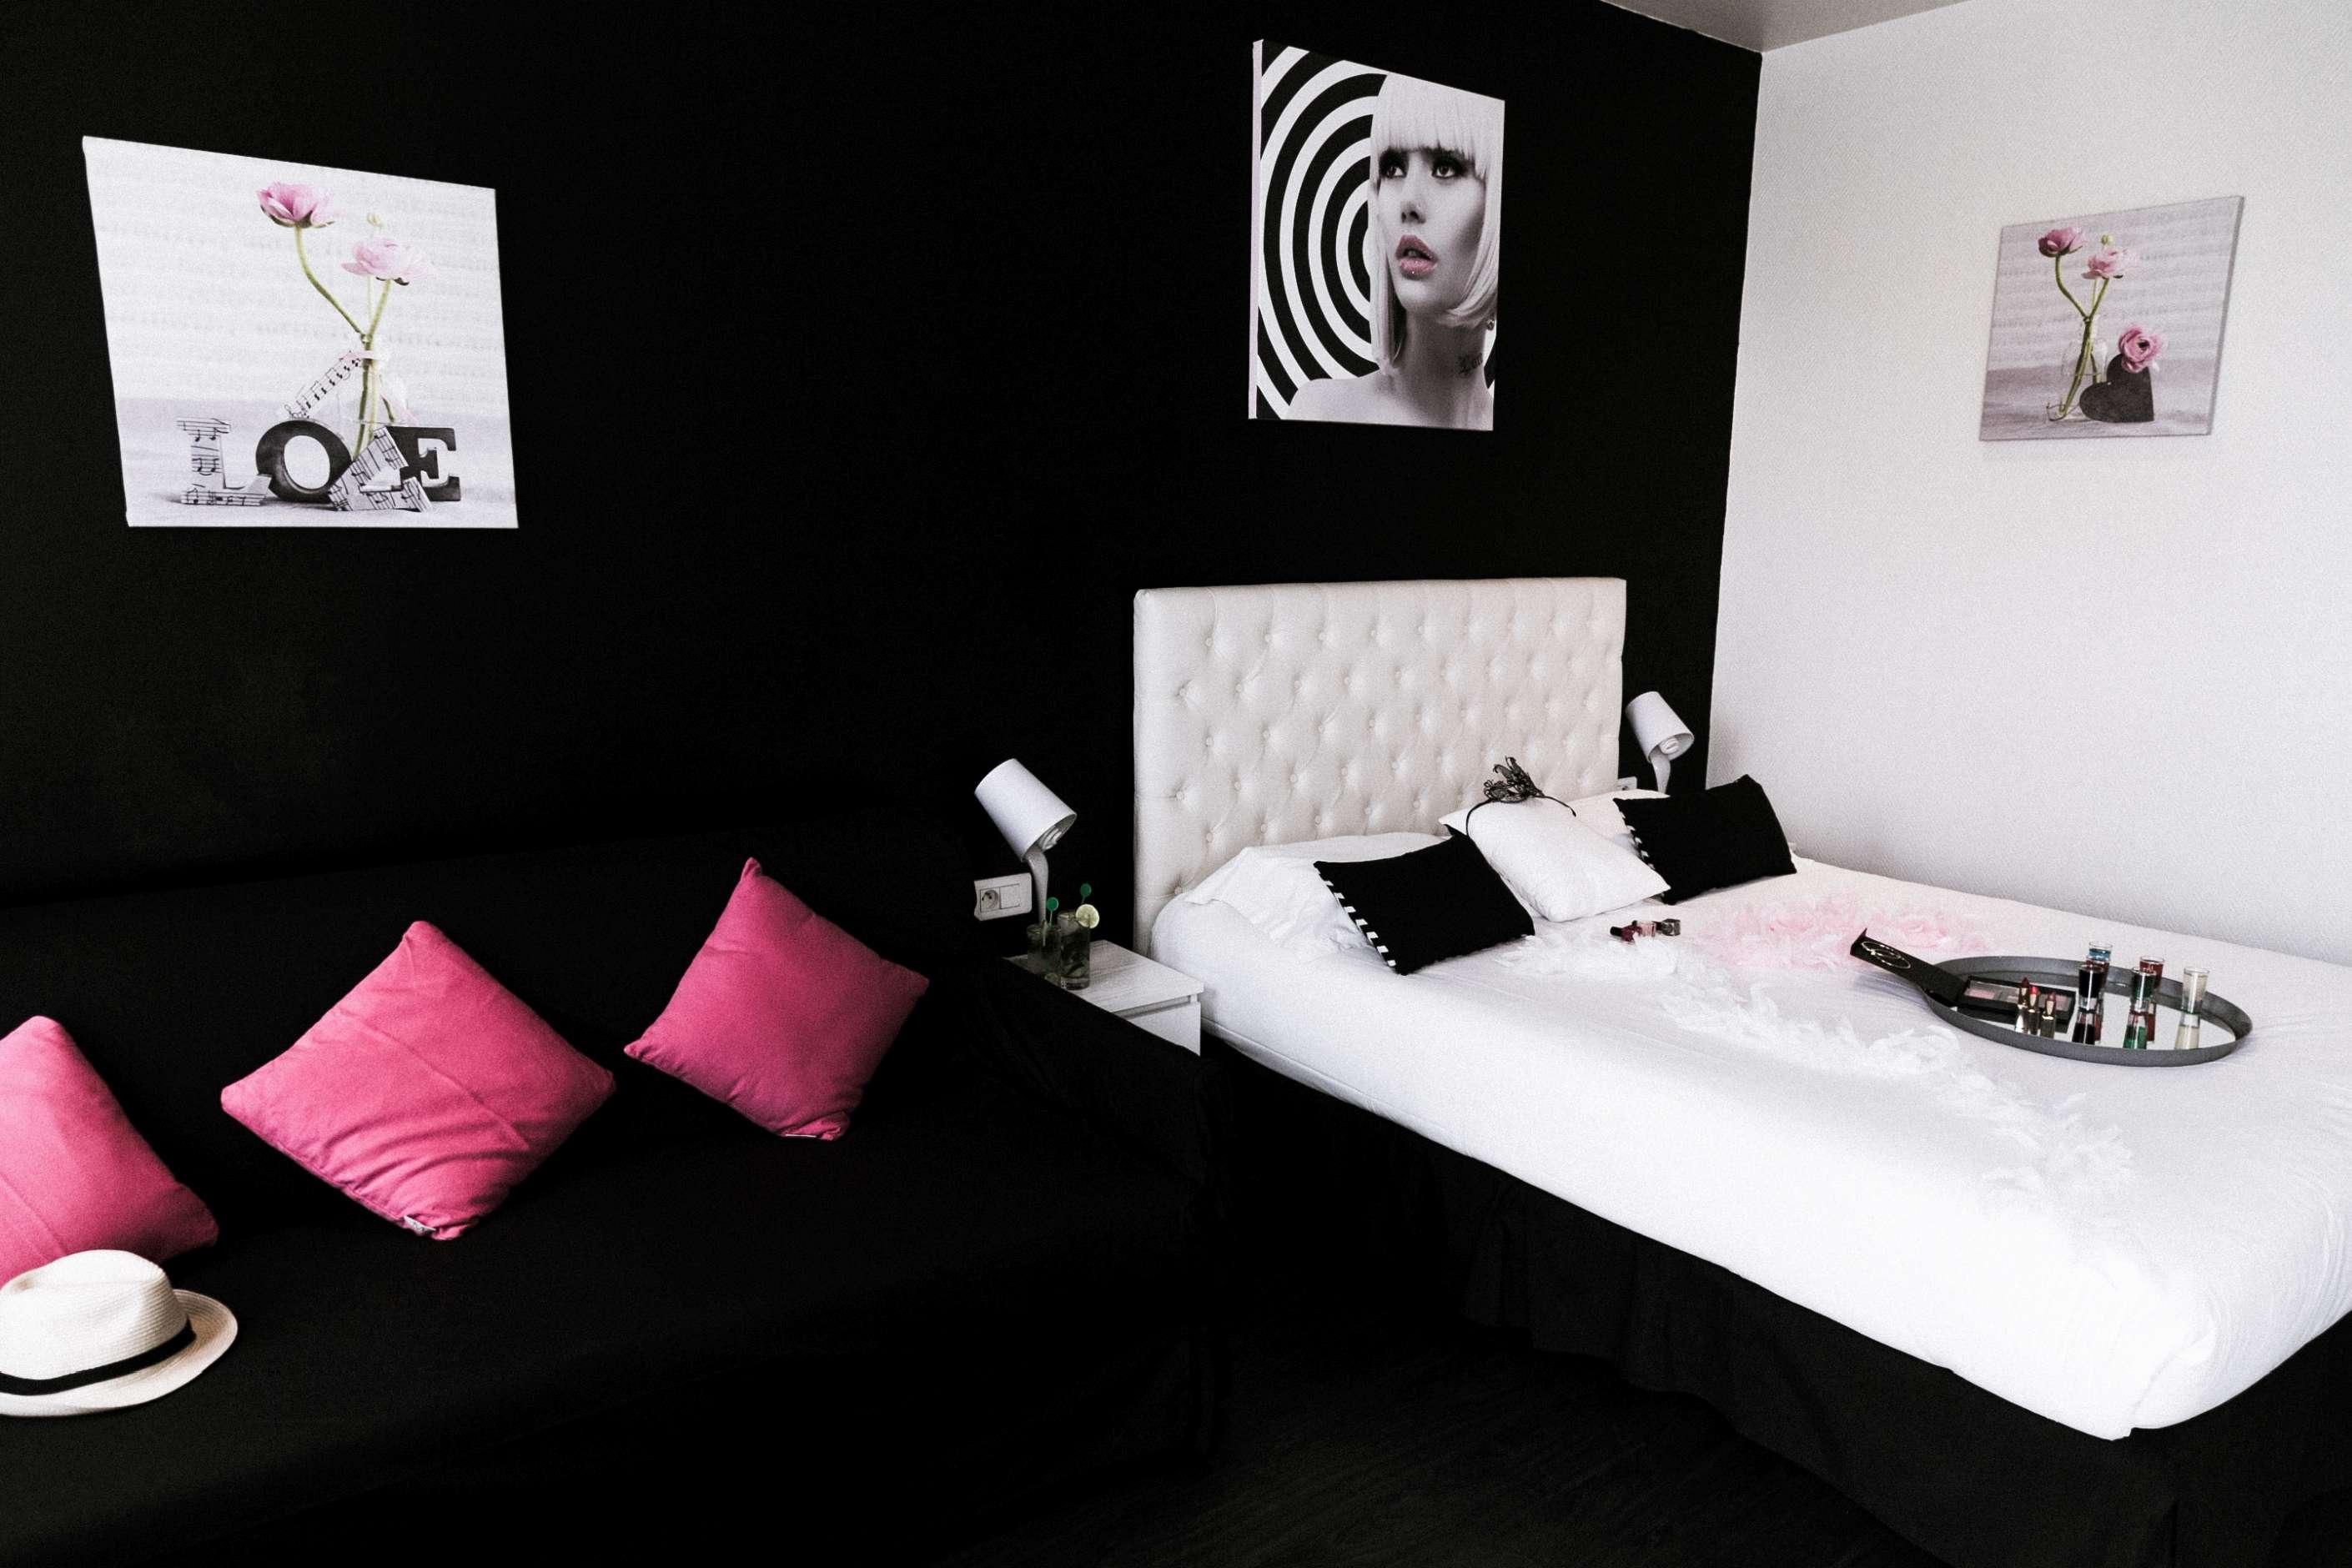 Ideal hotel design paris site officiel gallerie for Ideal hotel paris 15